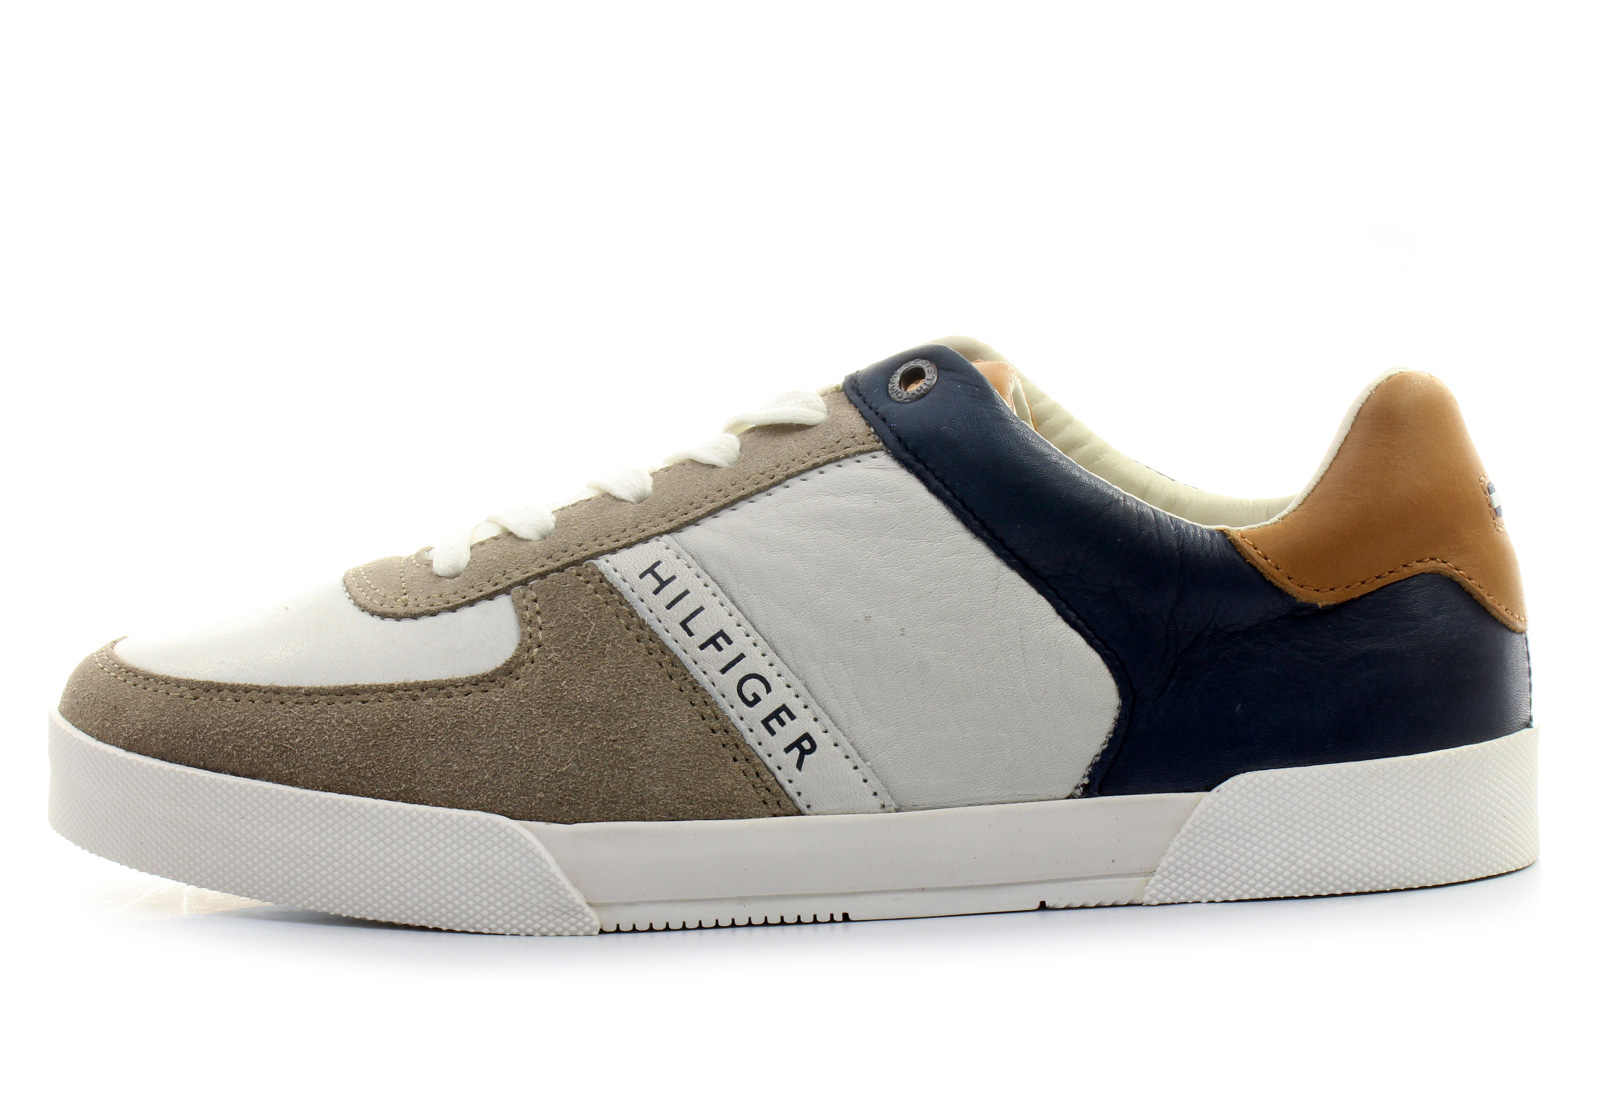 Tommy Hilfiger Cipő - Maddox 1c - 15S-8927-156 - Office Shoes ... 2b6608165d